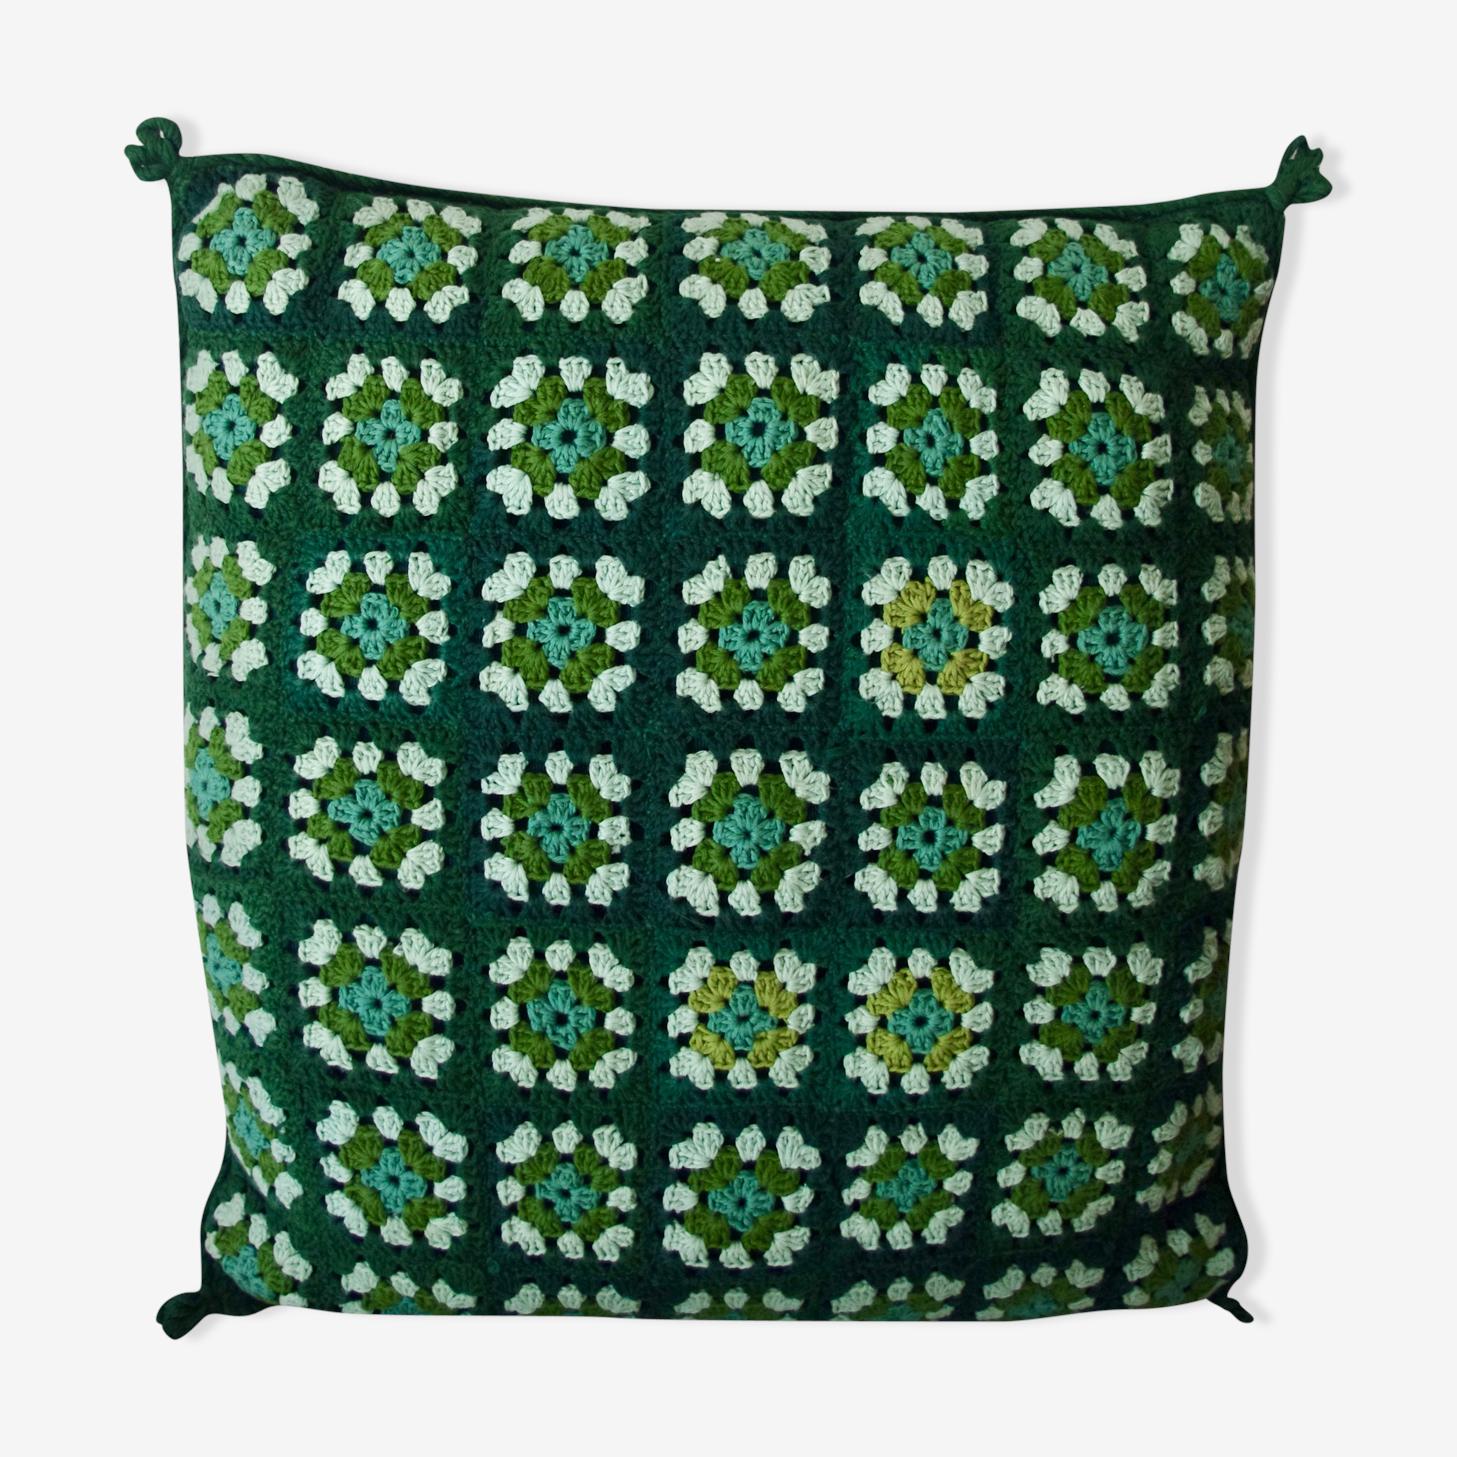 Green vintage crochet cushion